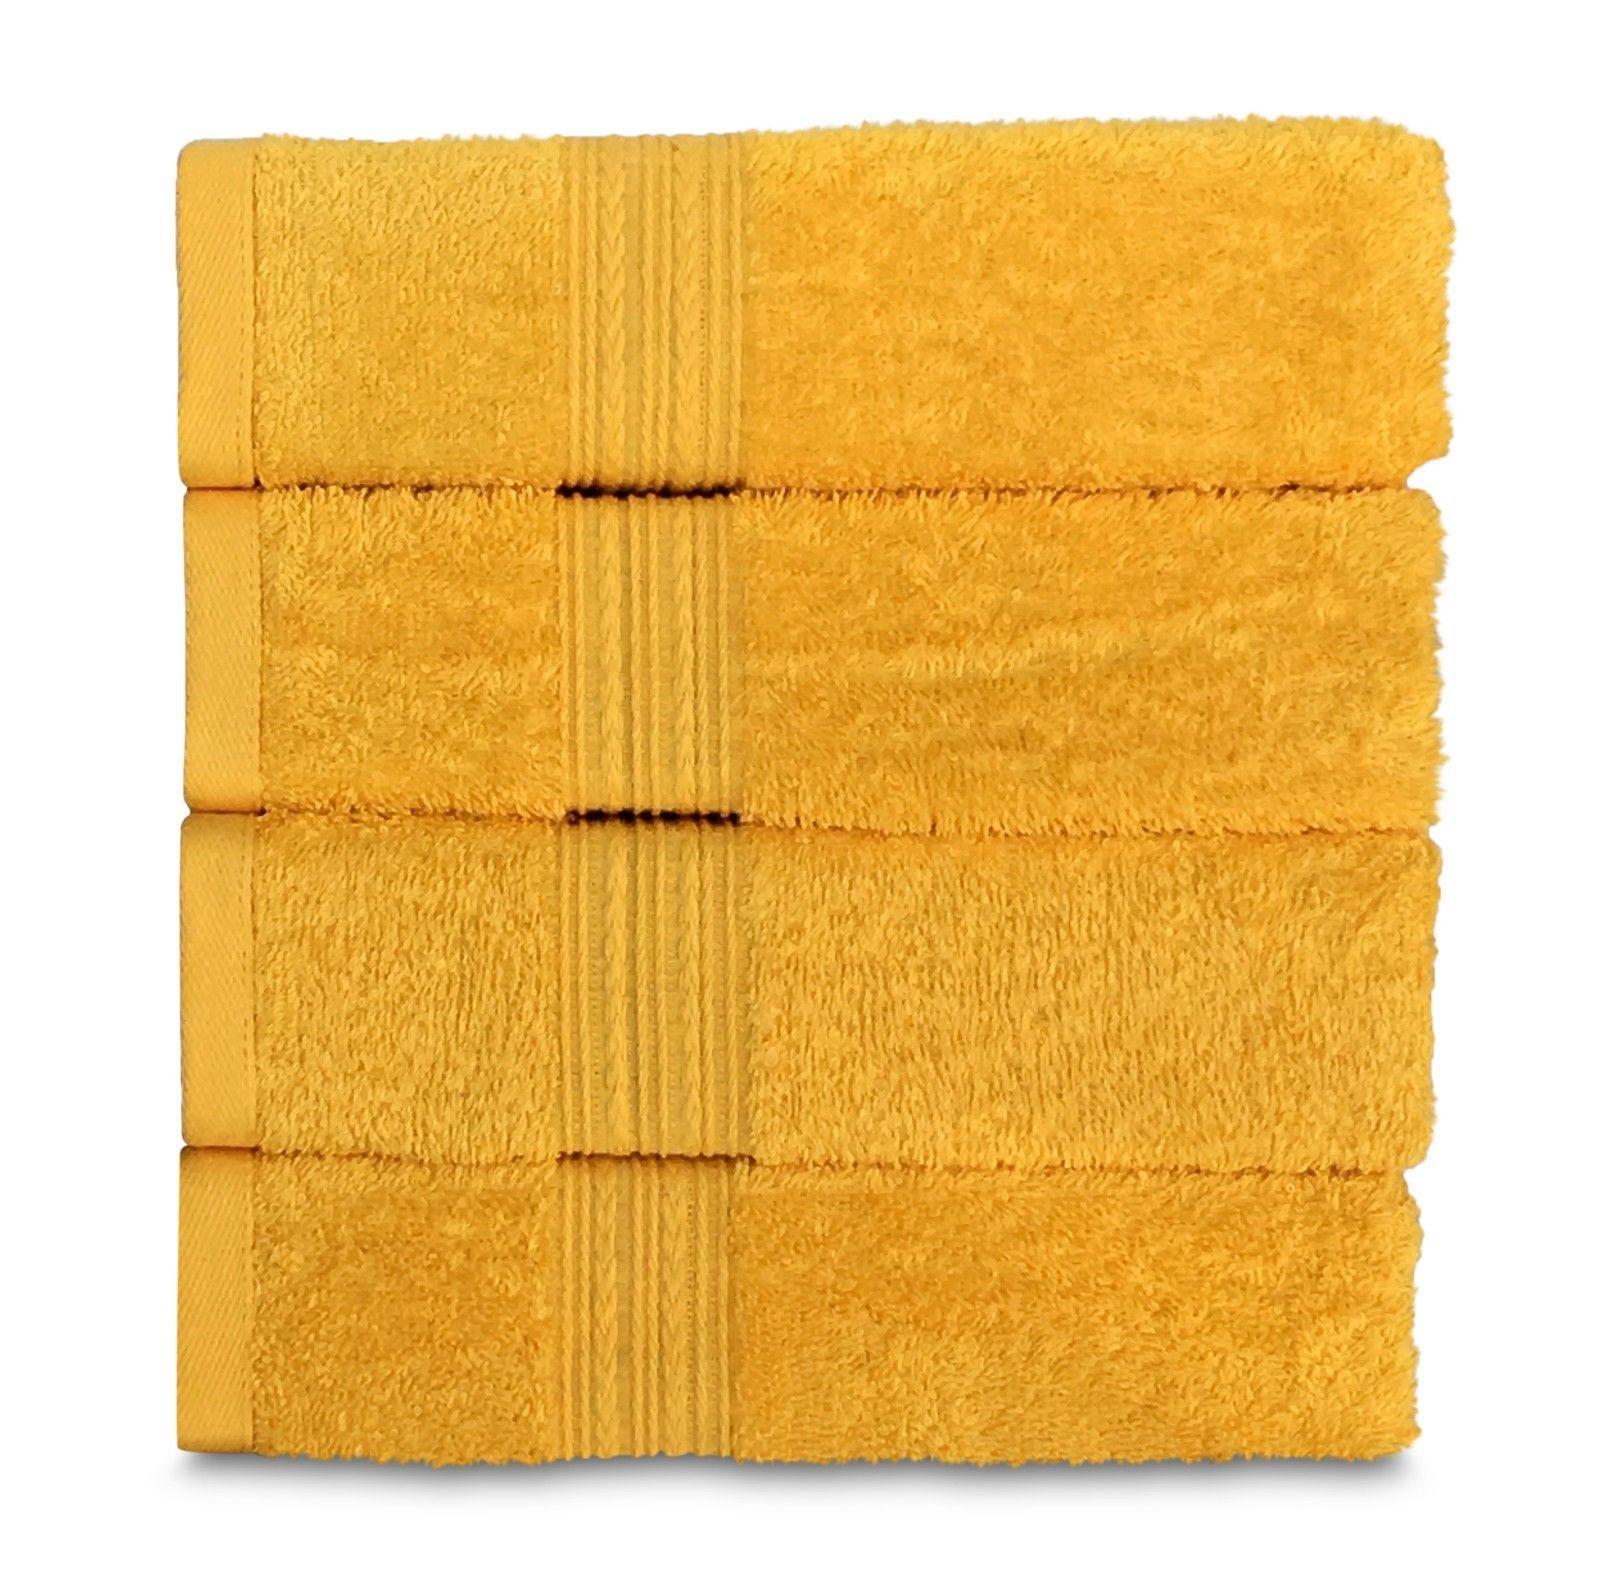 Goza Towels %100 Hand Towels, Gym, SPA 4